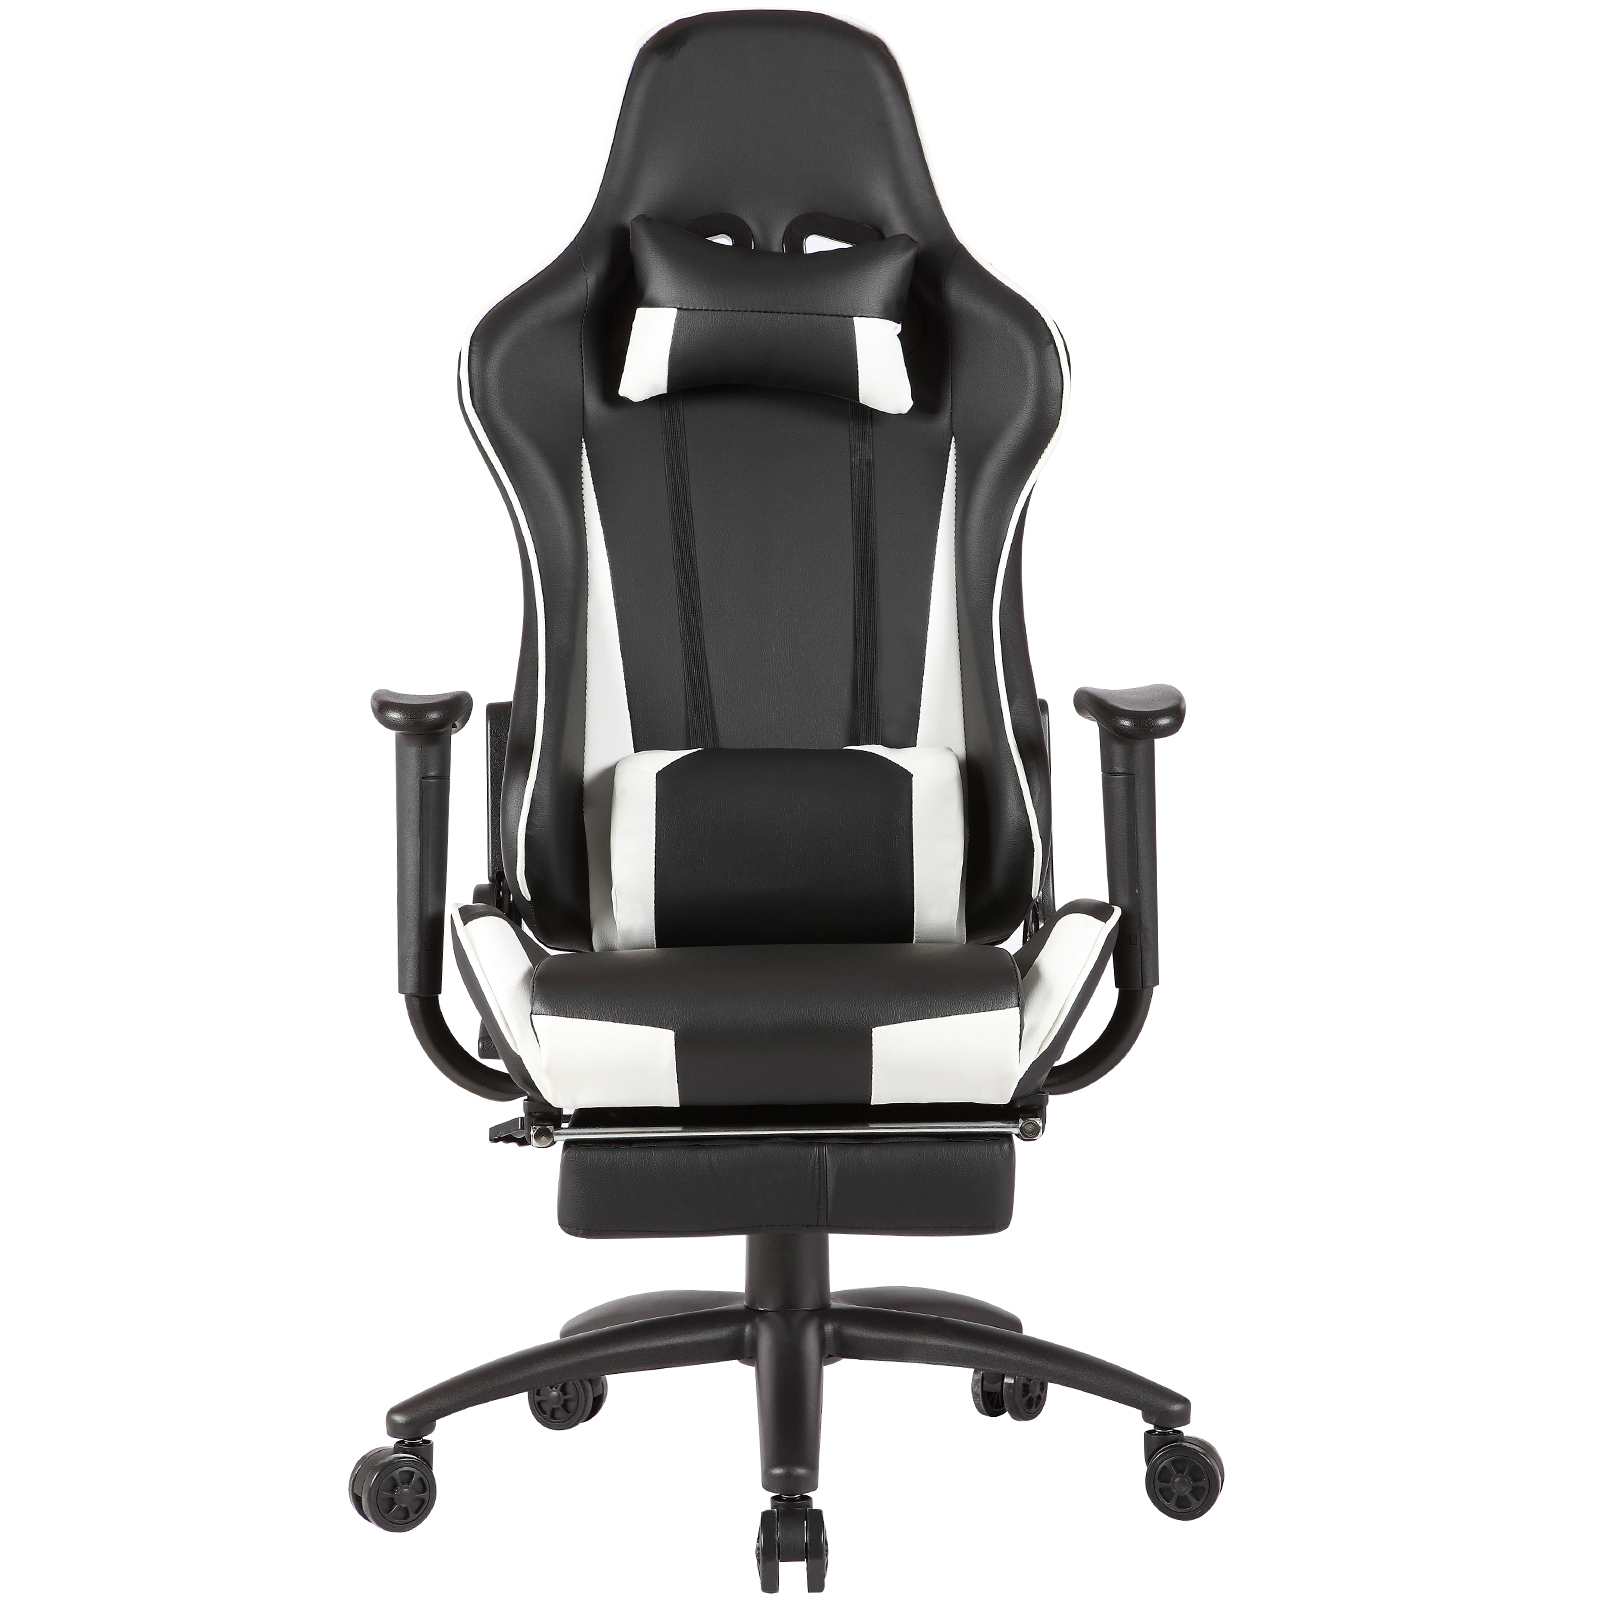 Drehstuhle Sessel Chefsessel Burostuhl Drehstuhl Racing Gaming Schalensitz Schreibtisch Stuhl Buro Unionshopper Com Au